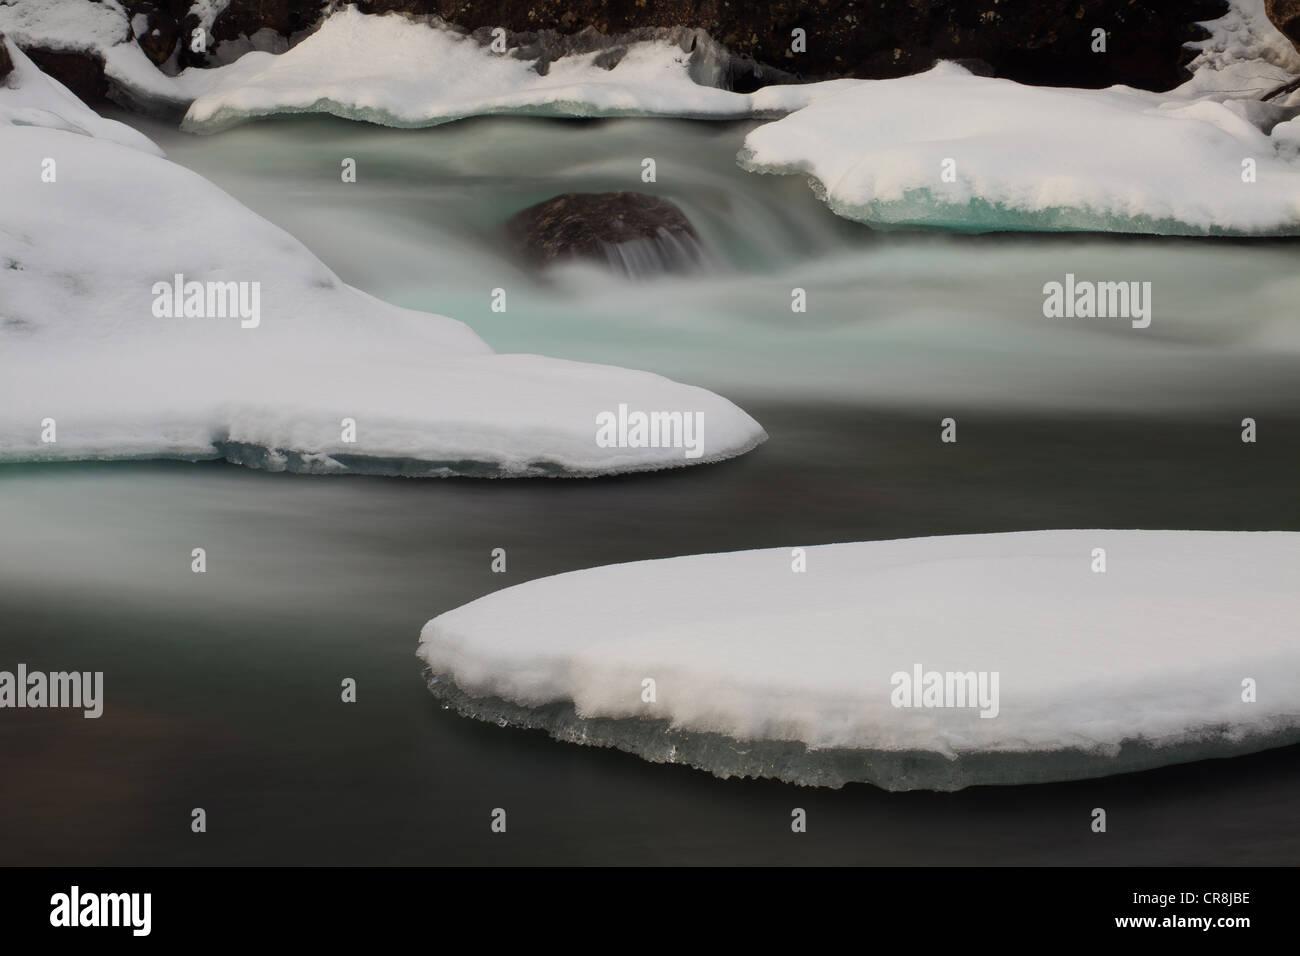 Neve e ghiaccio nel fiume Rauma, Romsdalen valley, Møre og Romsdal, Norvegia. Foto Stock